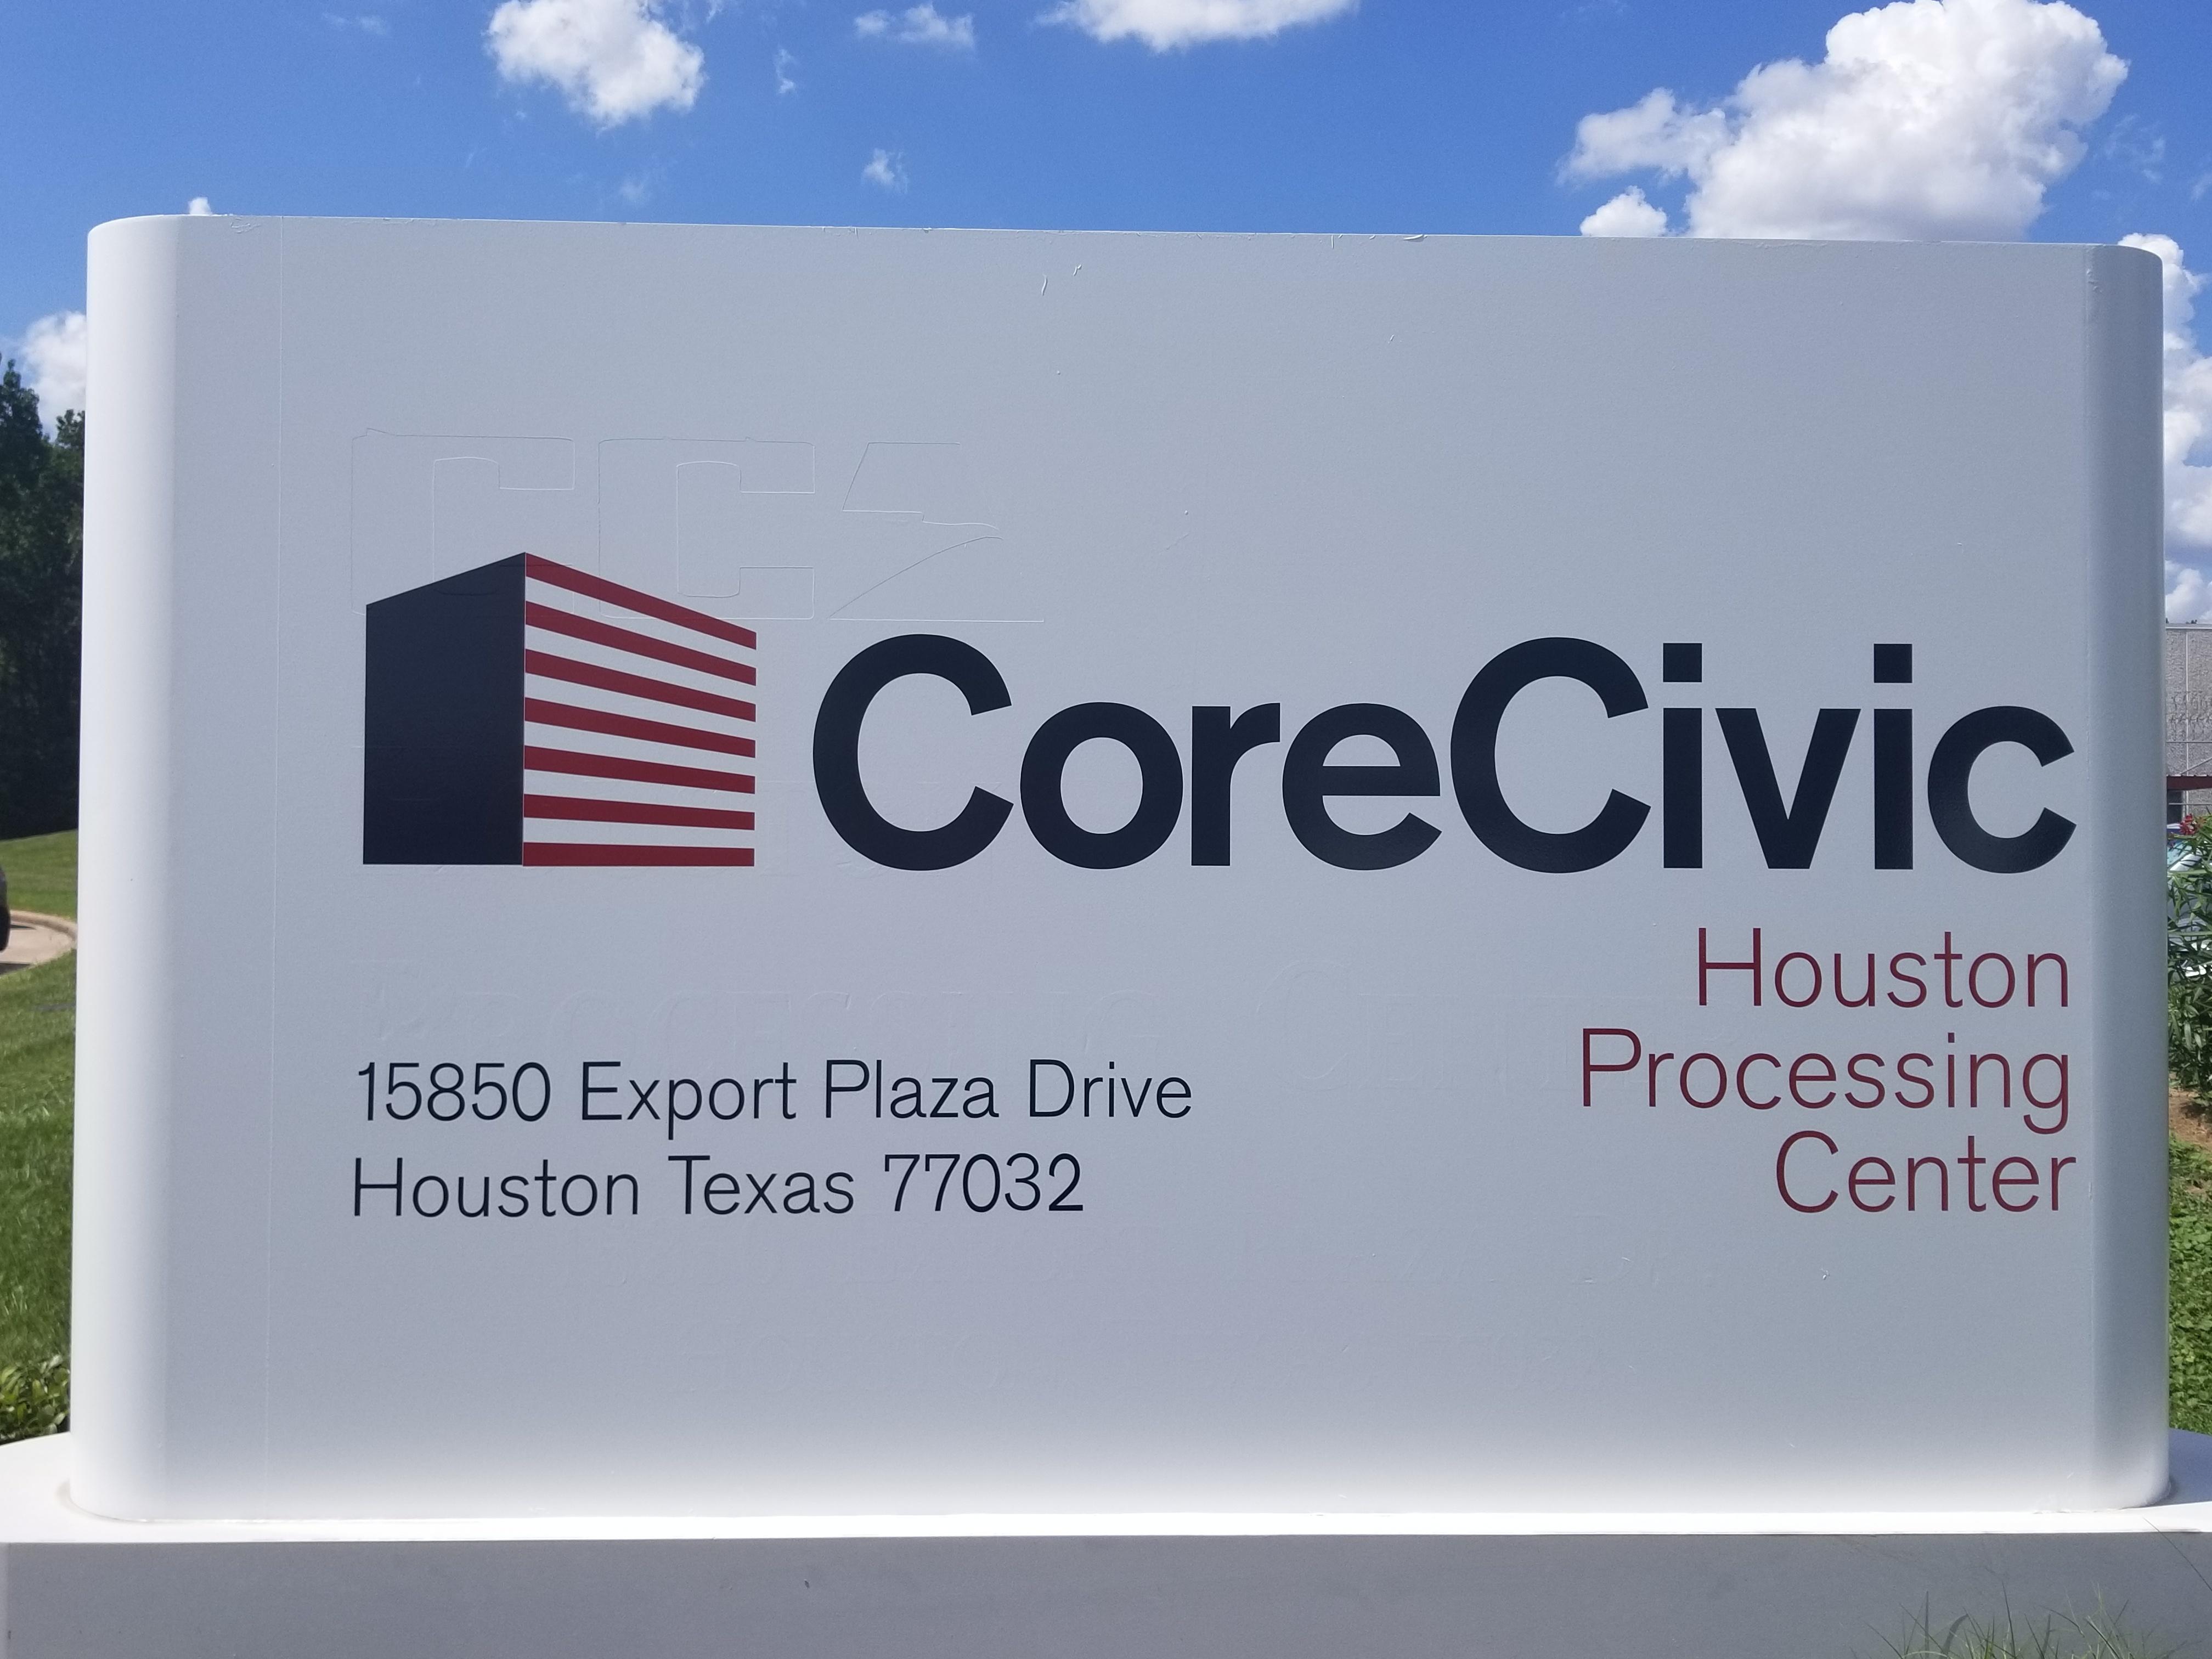 Houston Processing Center